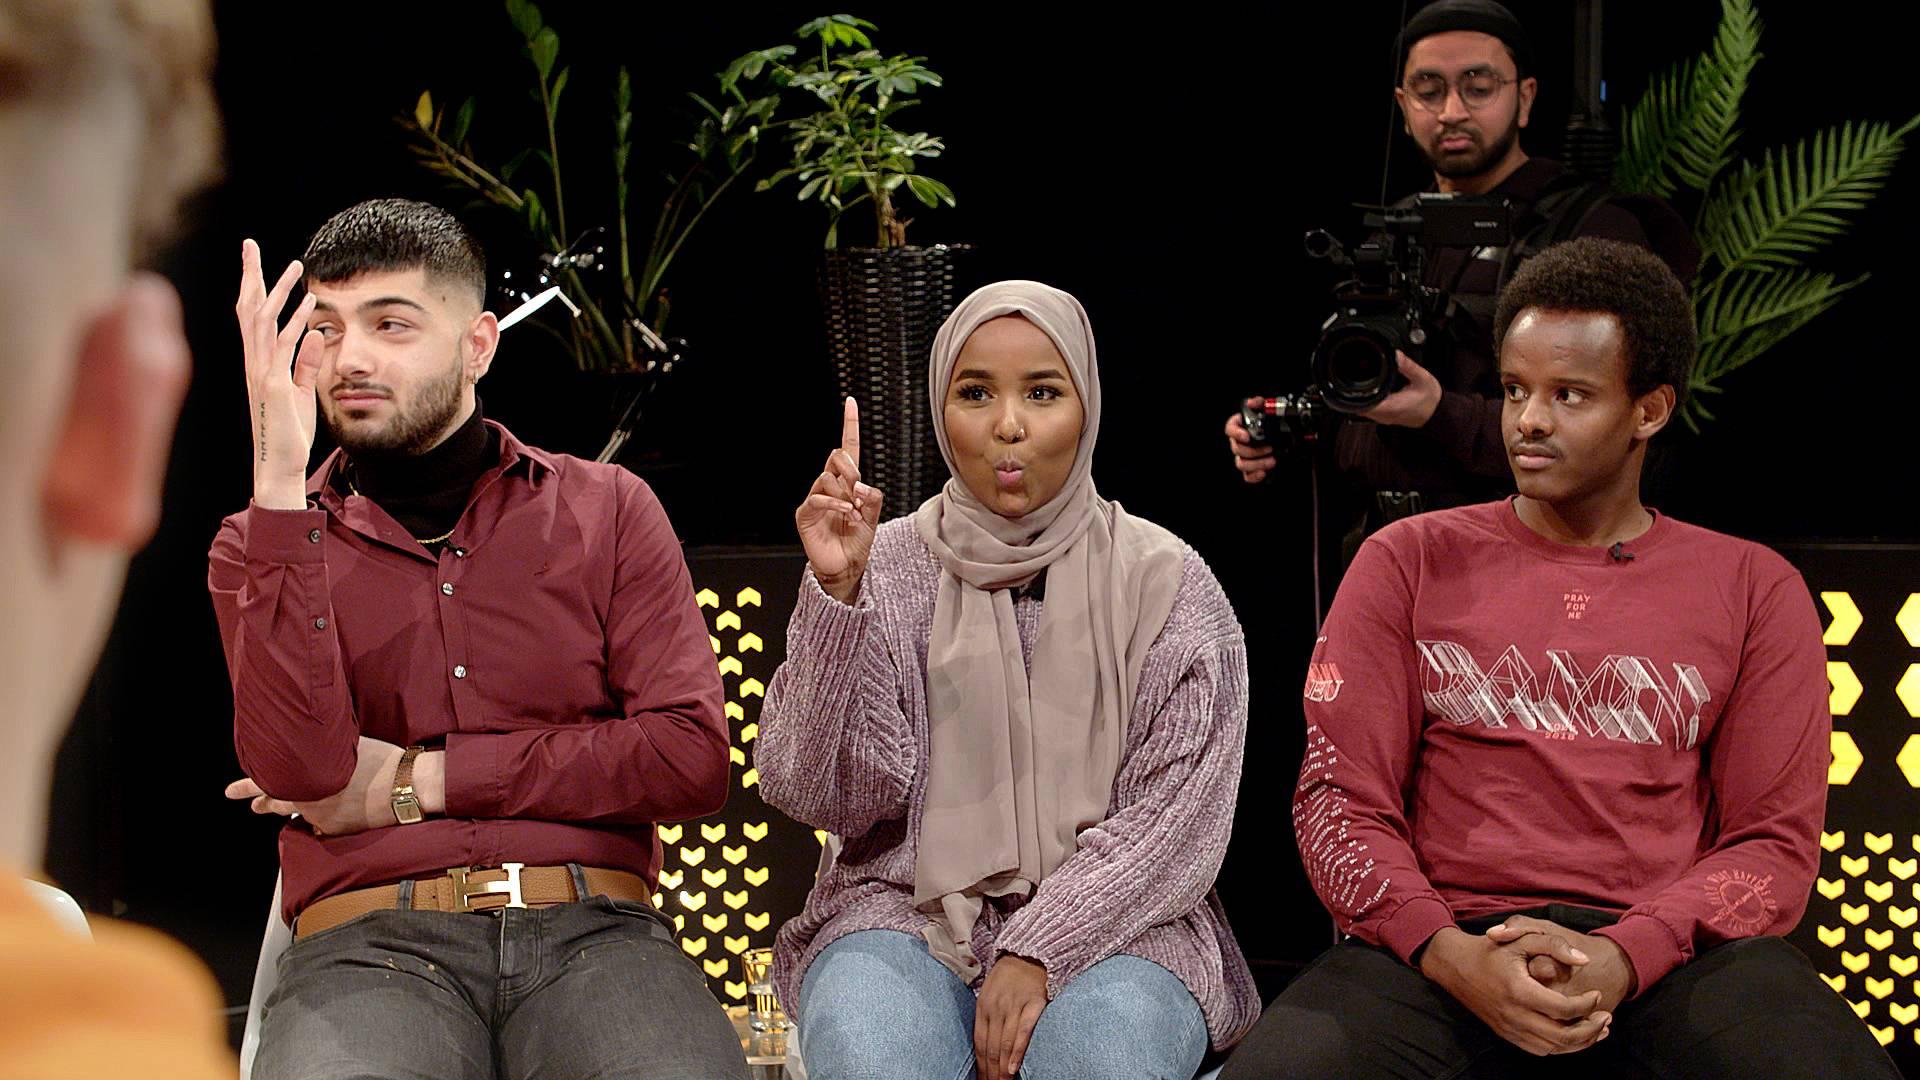 Chattes episode 2 - rasisme